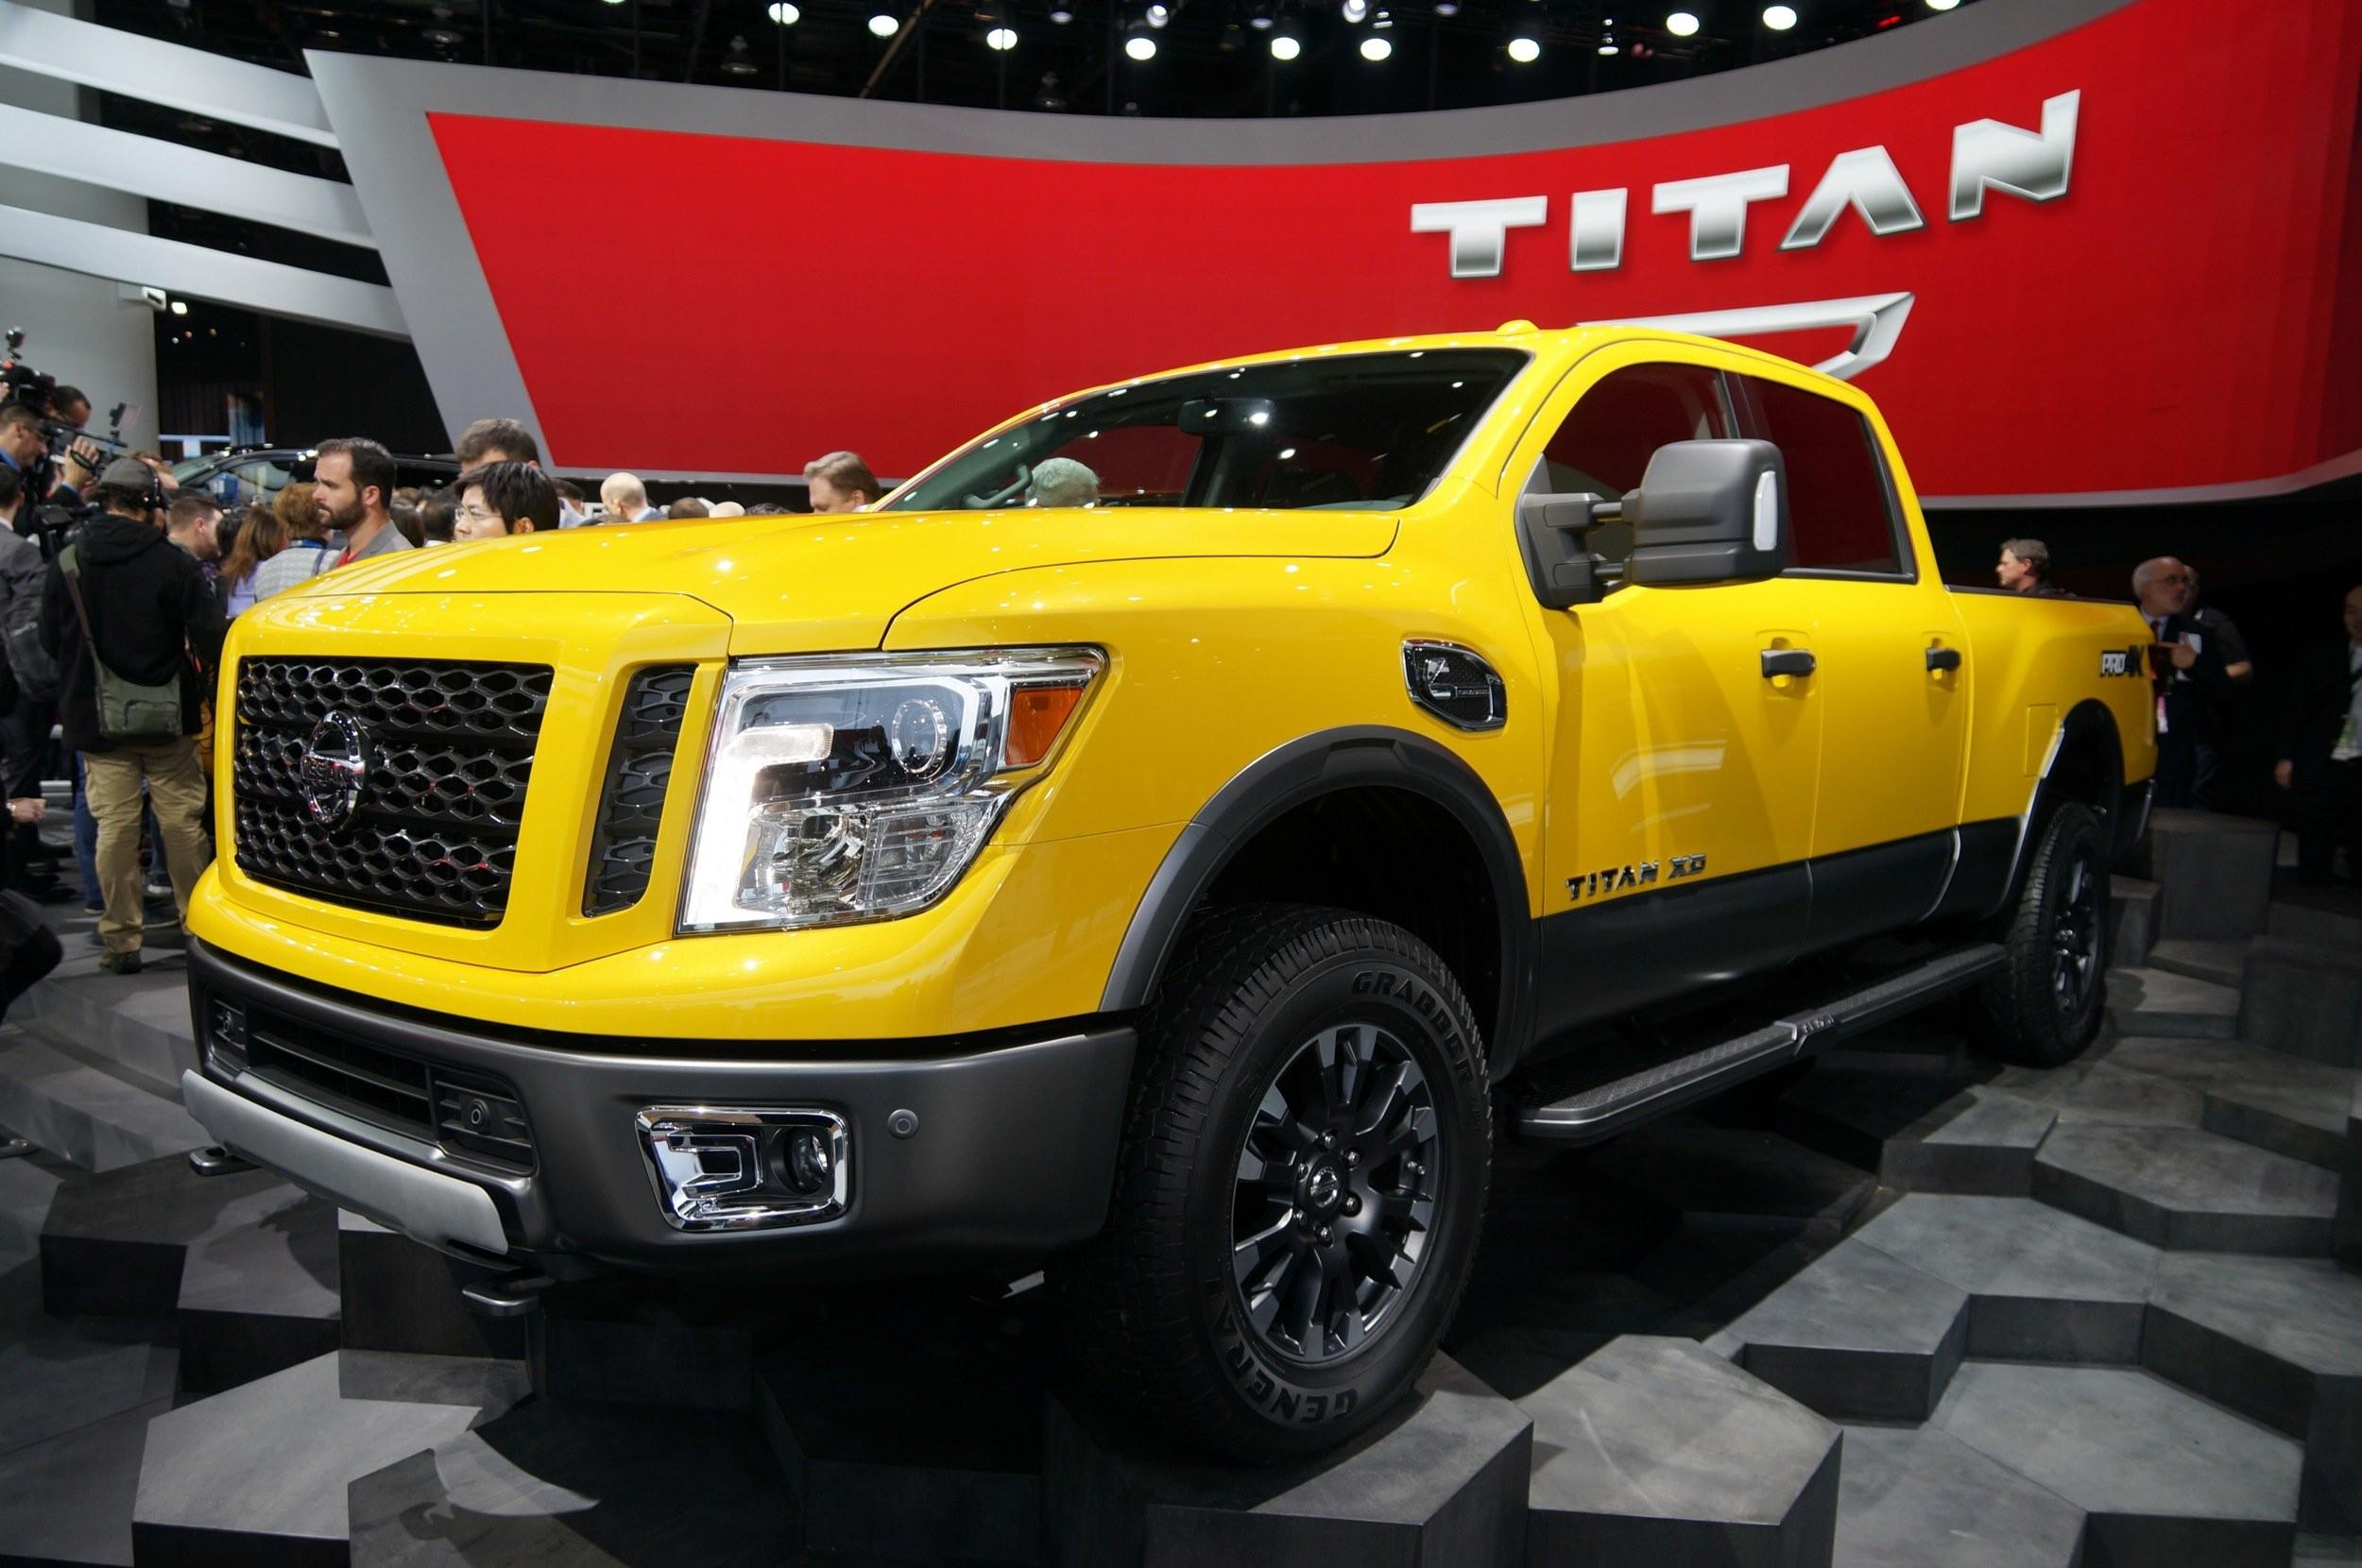 2016 Nissan Titan Diesel Car Wallpaper Desktop HD